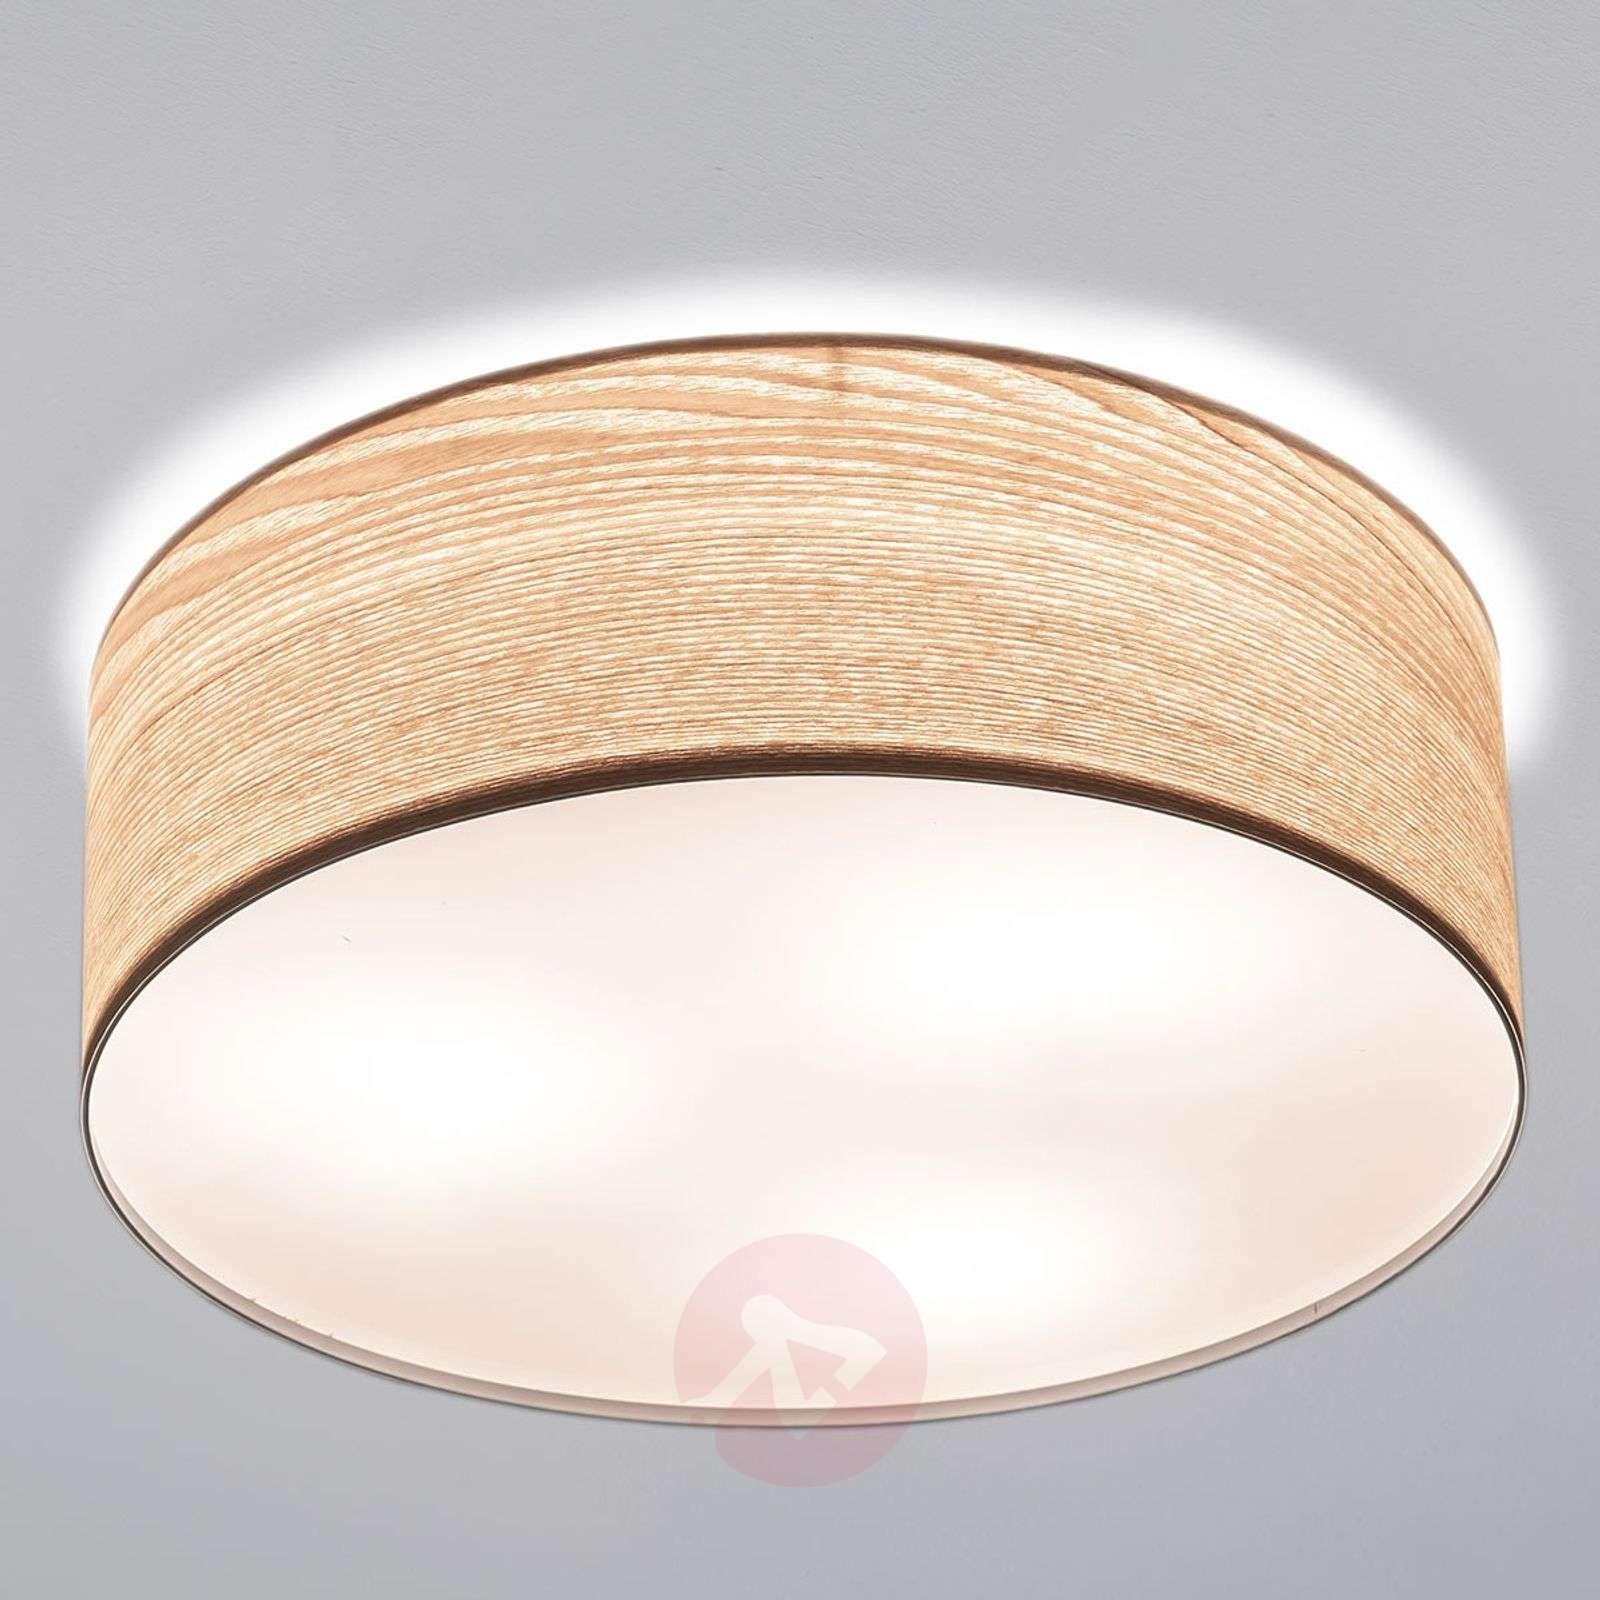 Muodikas Liska-pöytälamppu vaaleaa puuta-7601084-01